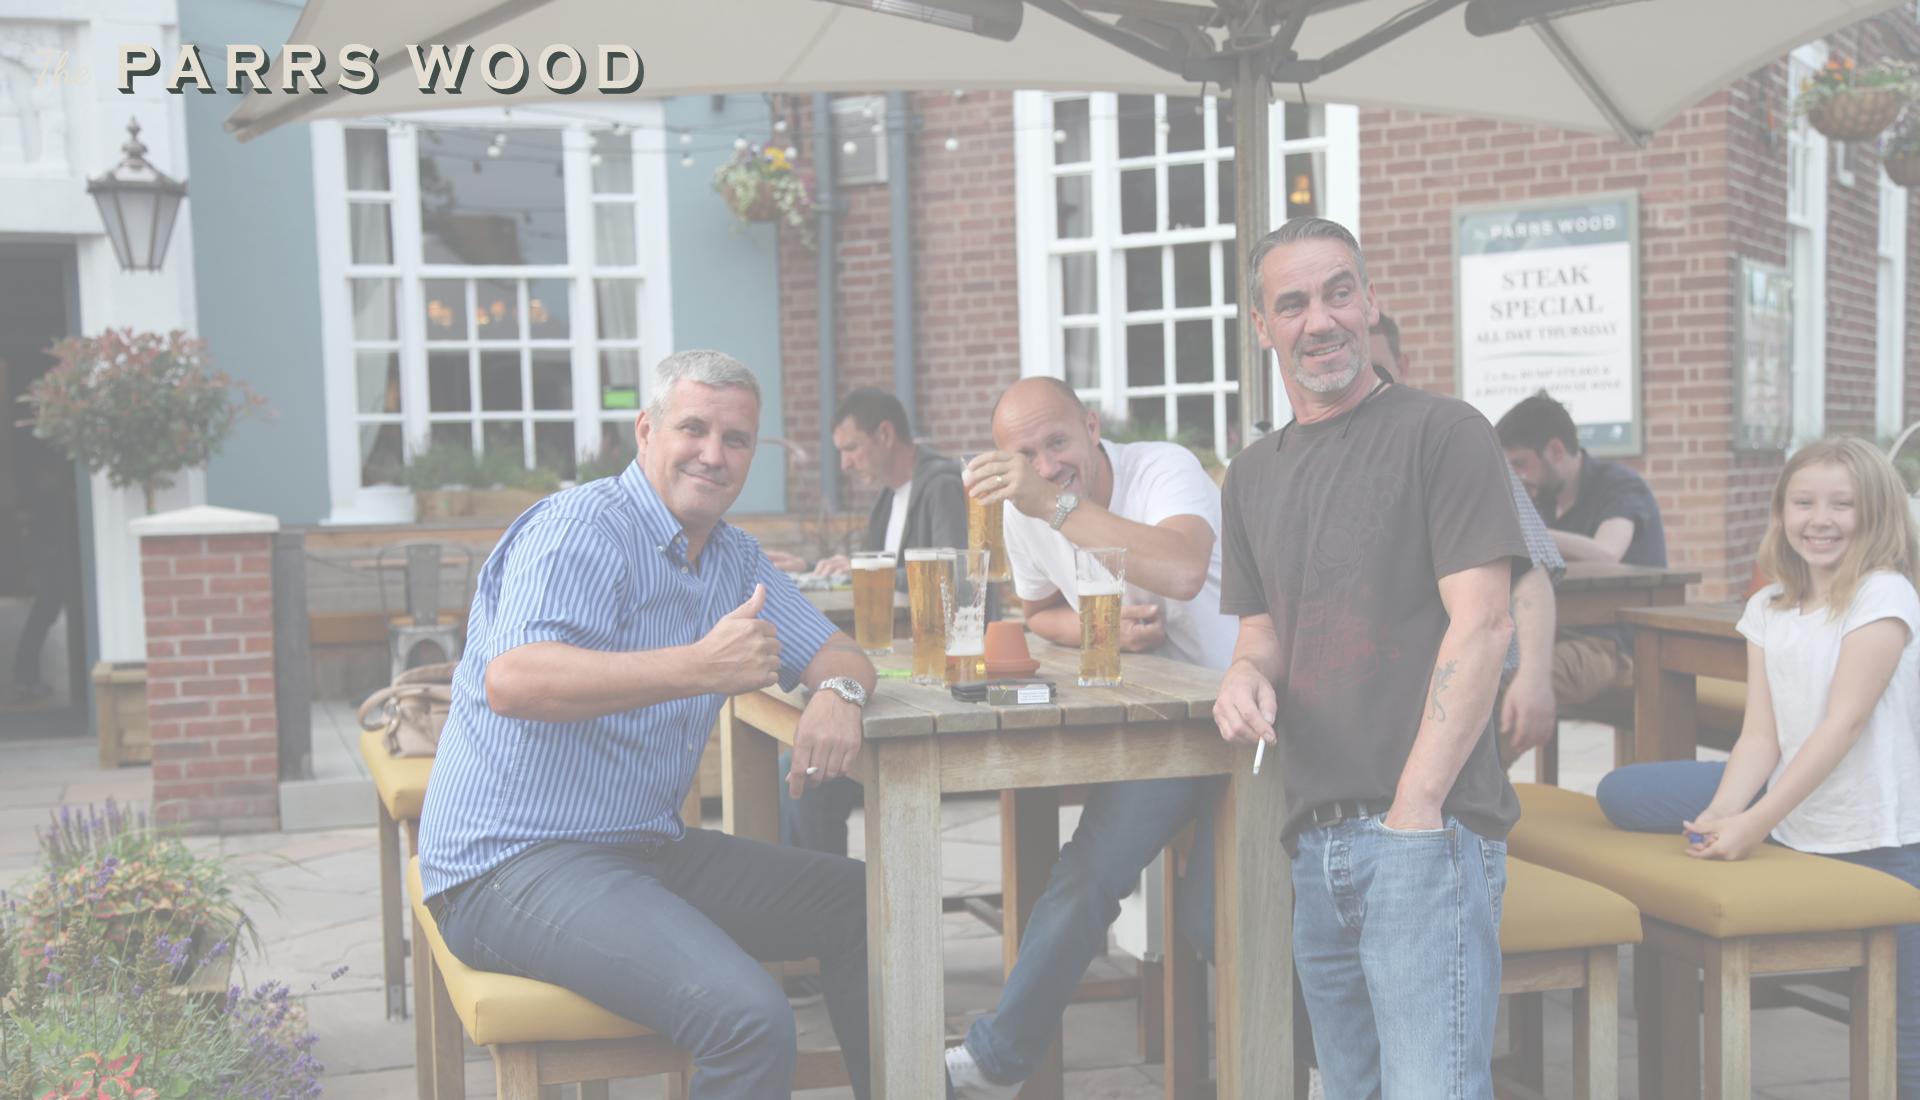 theparrswood-didsbury-manchester-pub-002